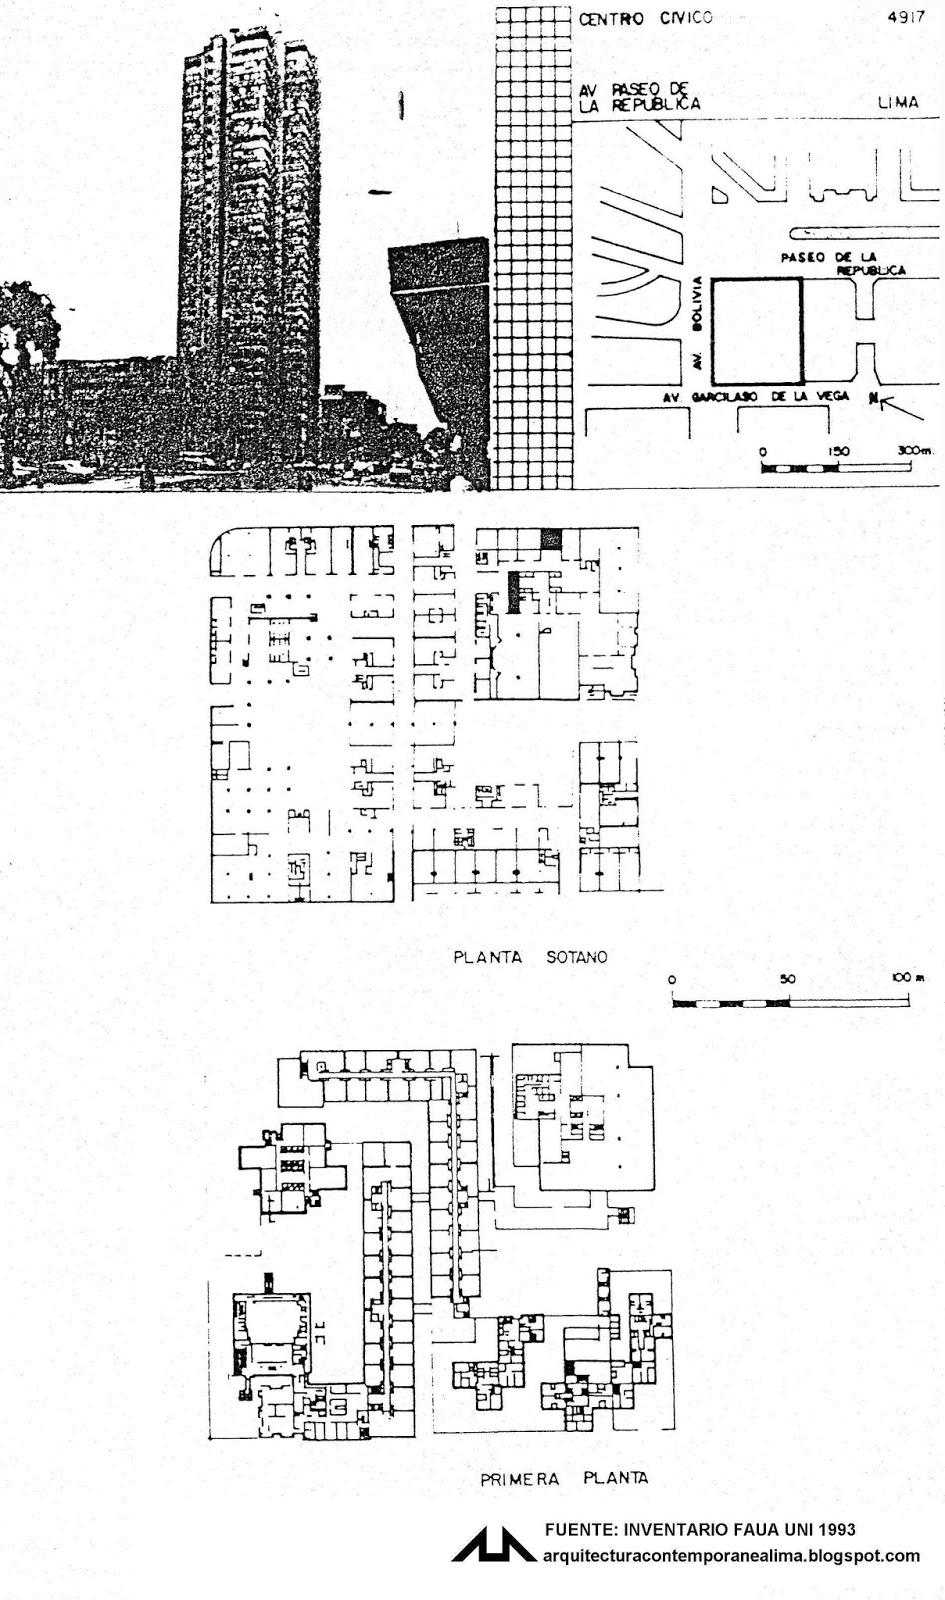 Arquitectura contemporanea de lima 4917 centro civico de lima for Ministerio de pesqueria